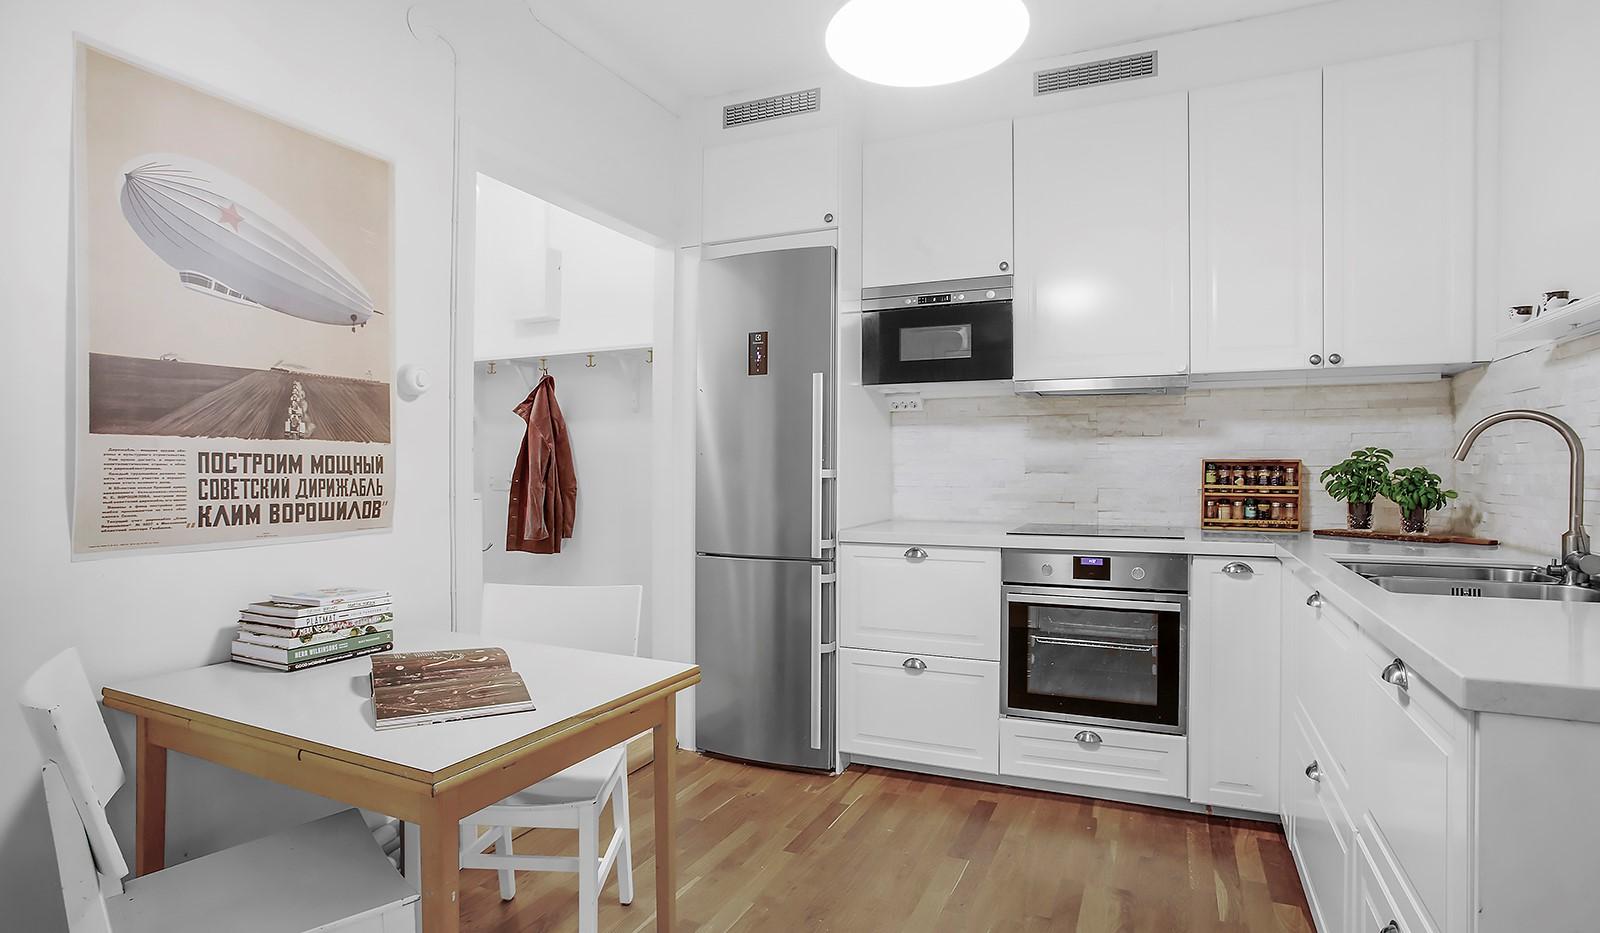 Heleneborgsgatan 30 - stilfullt kök